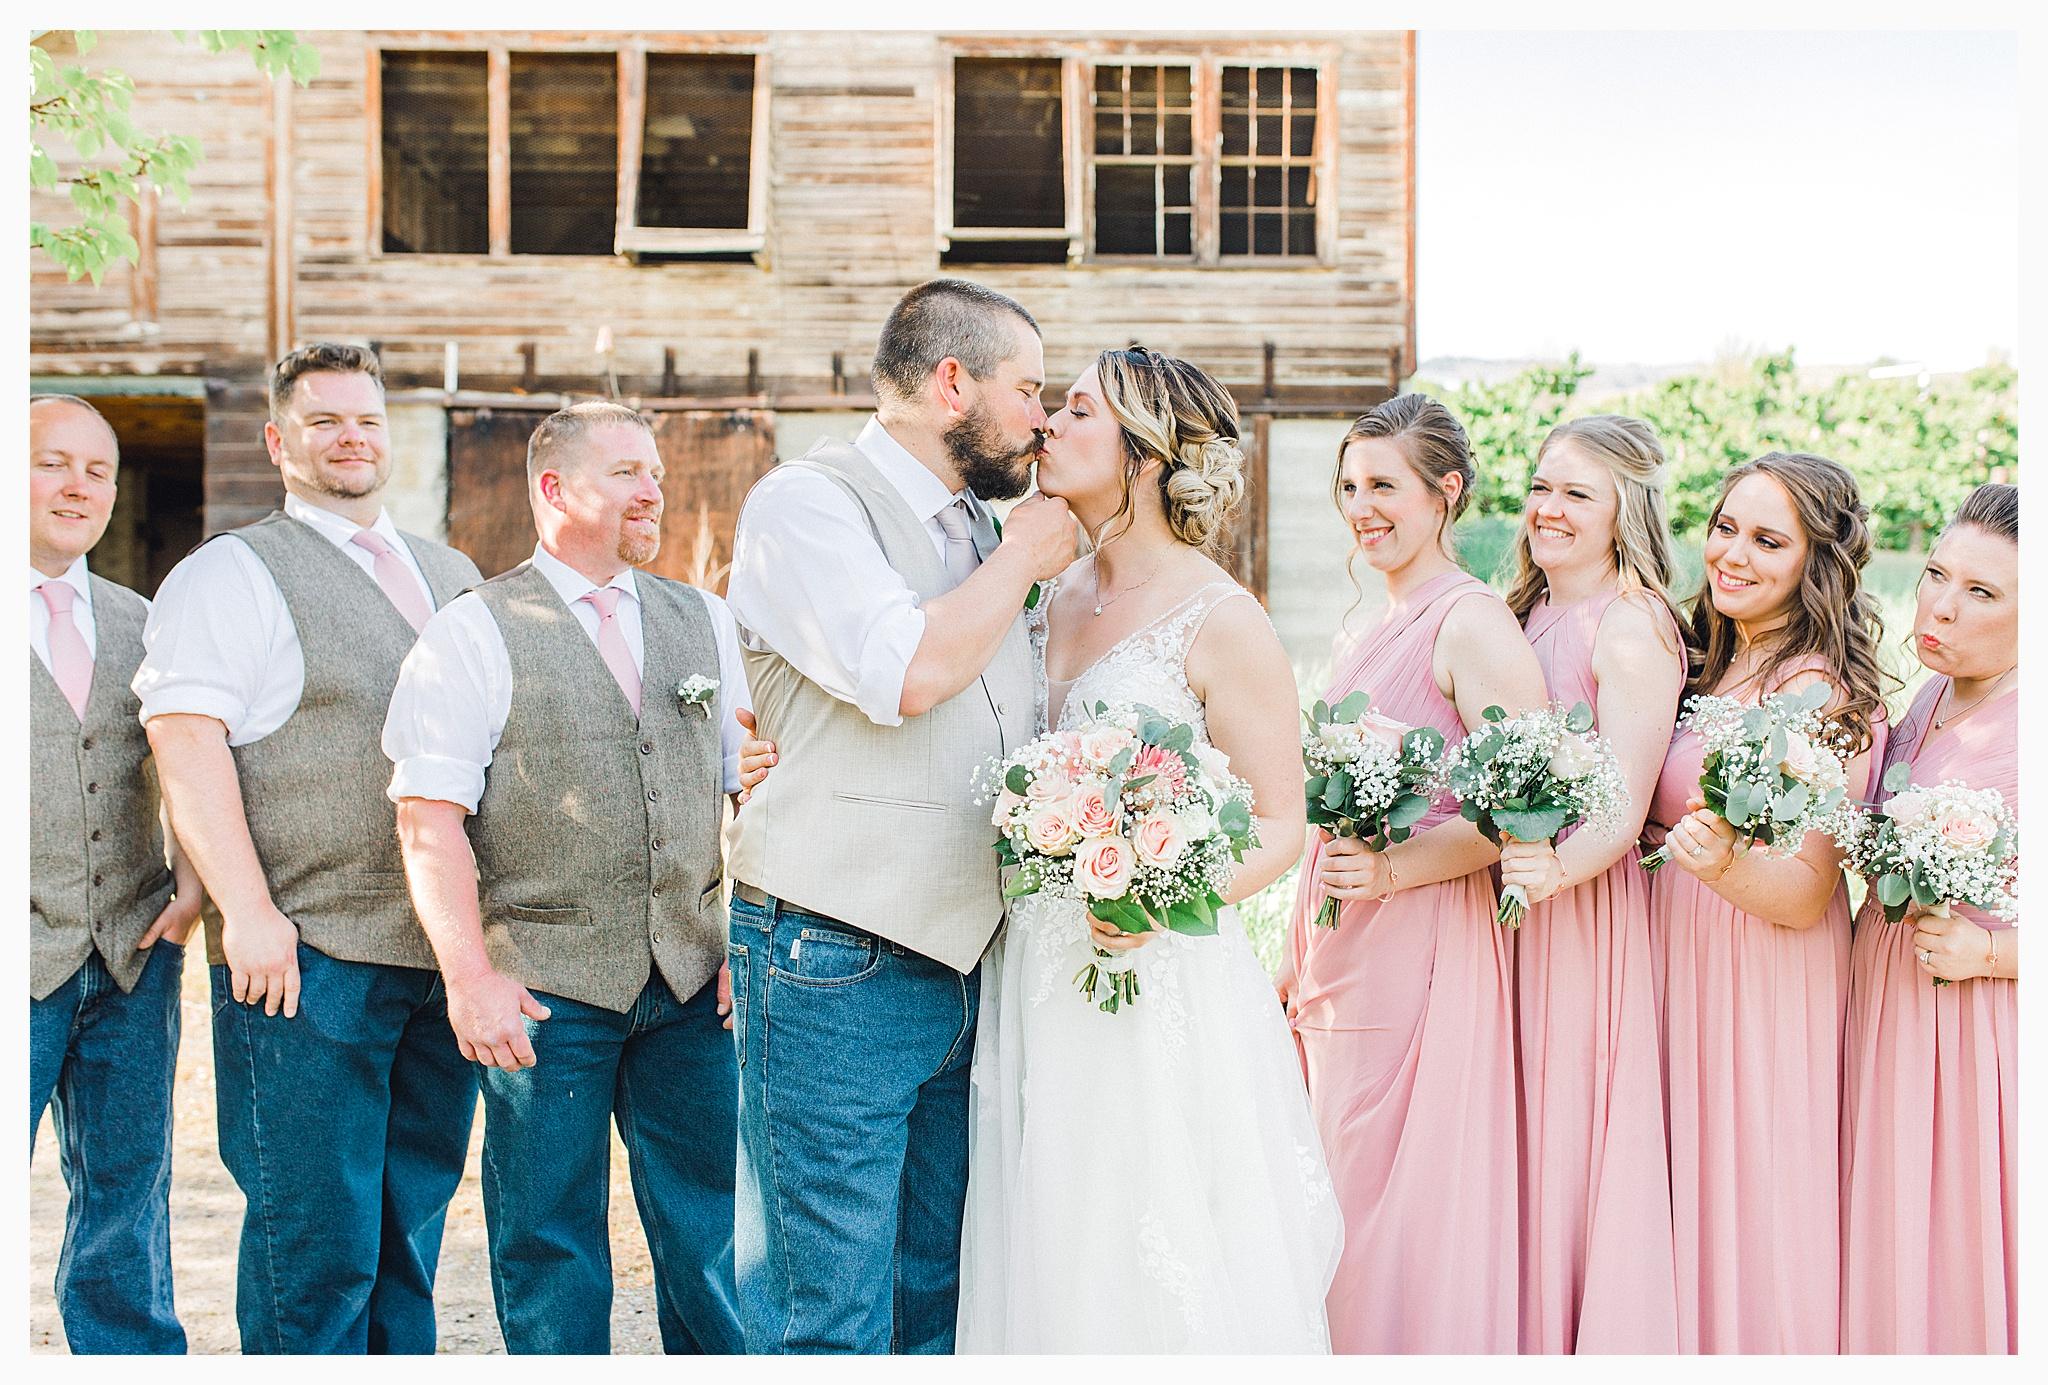 Rustic barn wedding in Wenatchee Washington at Sunshine Ranch on Easy Street, Emma Rose Company Seattle PNW Light and Airy Wedding Photographer_0083.jpg